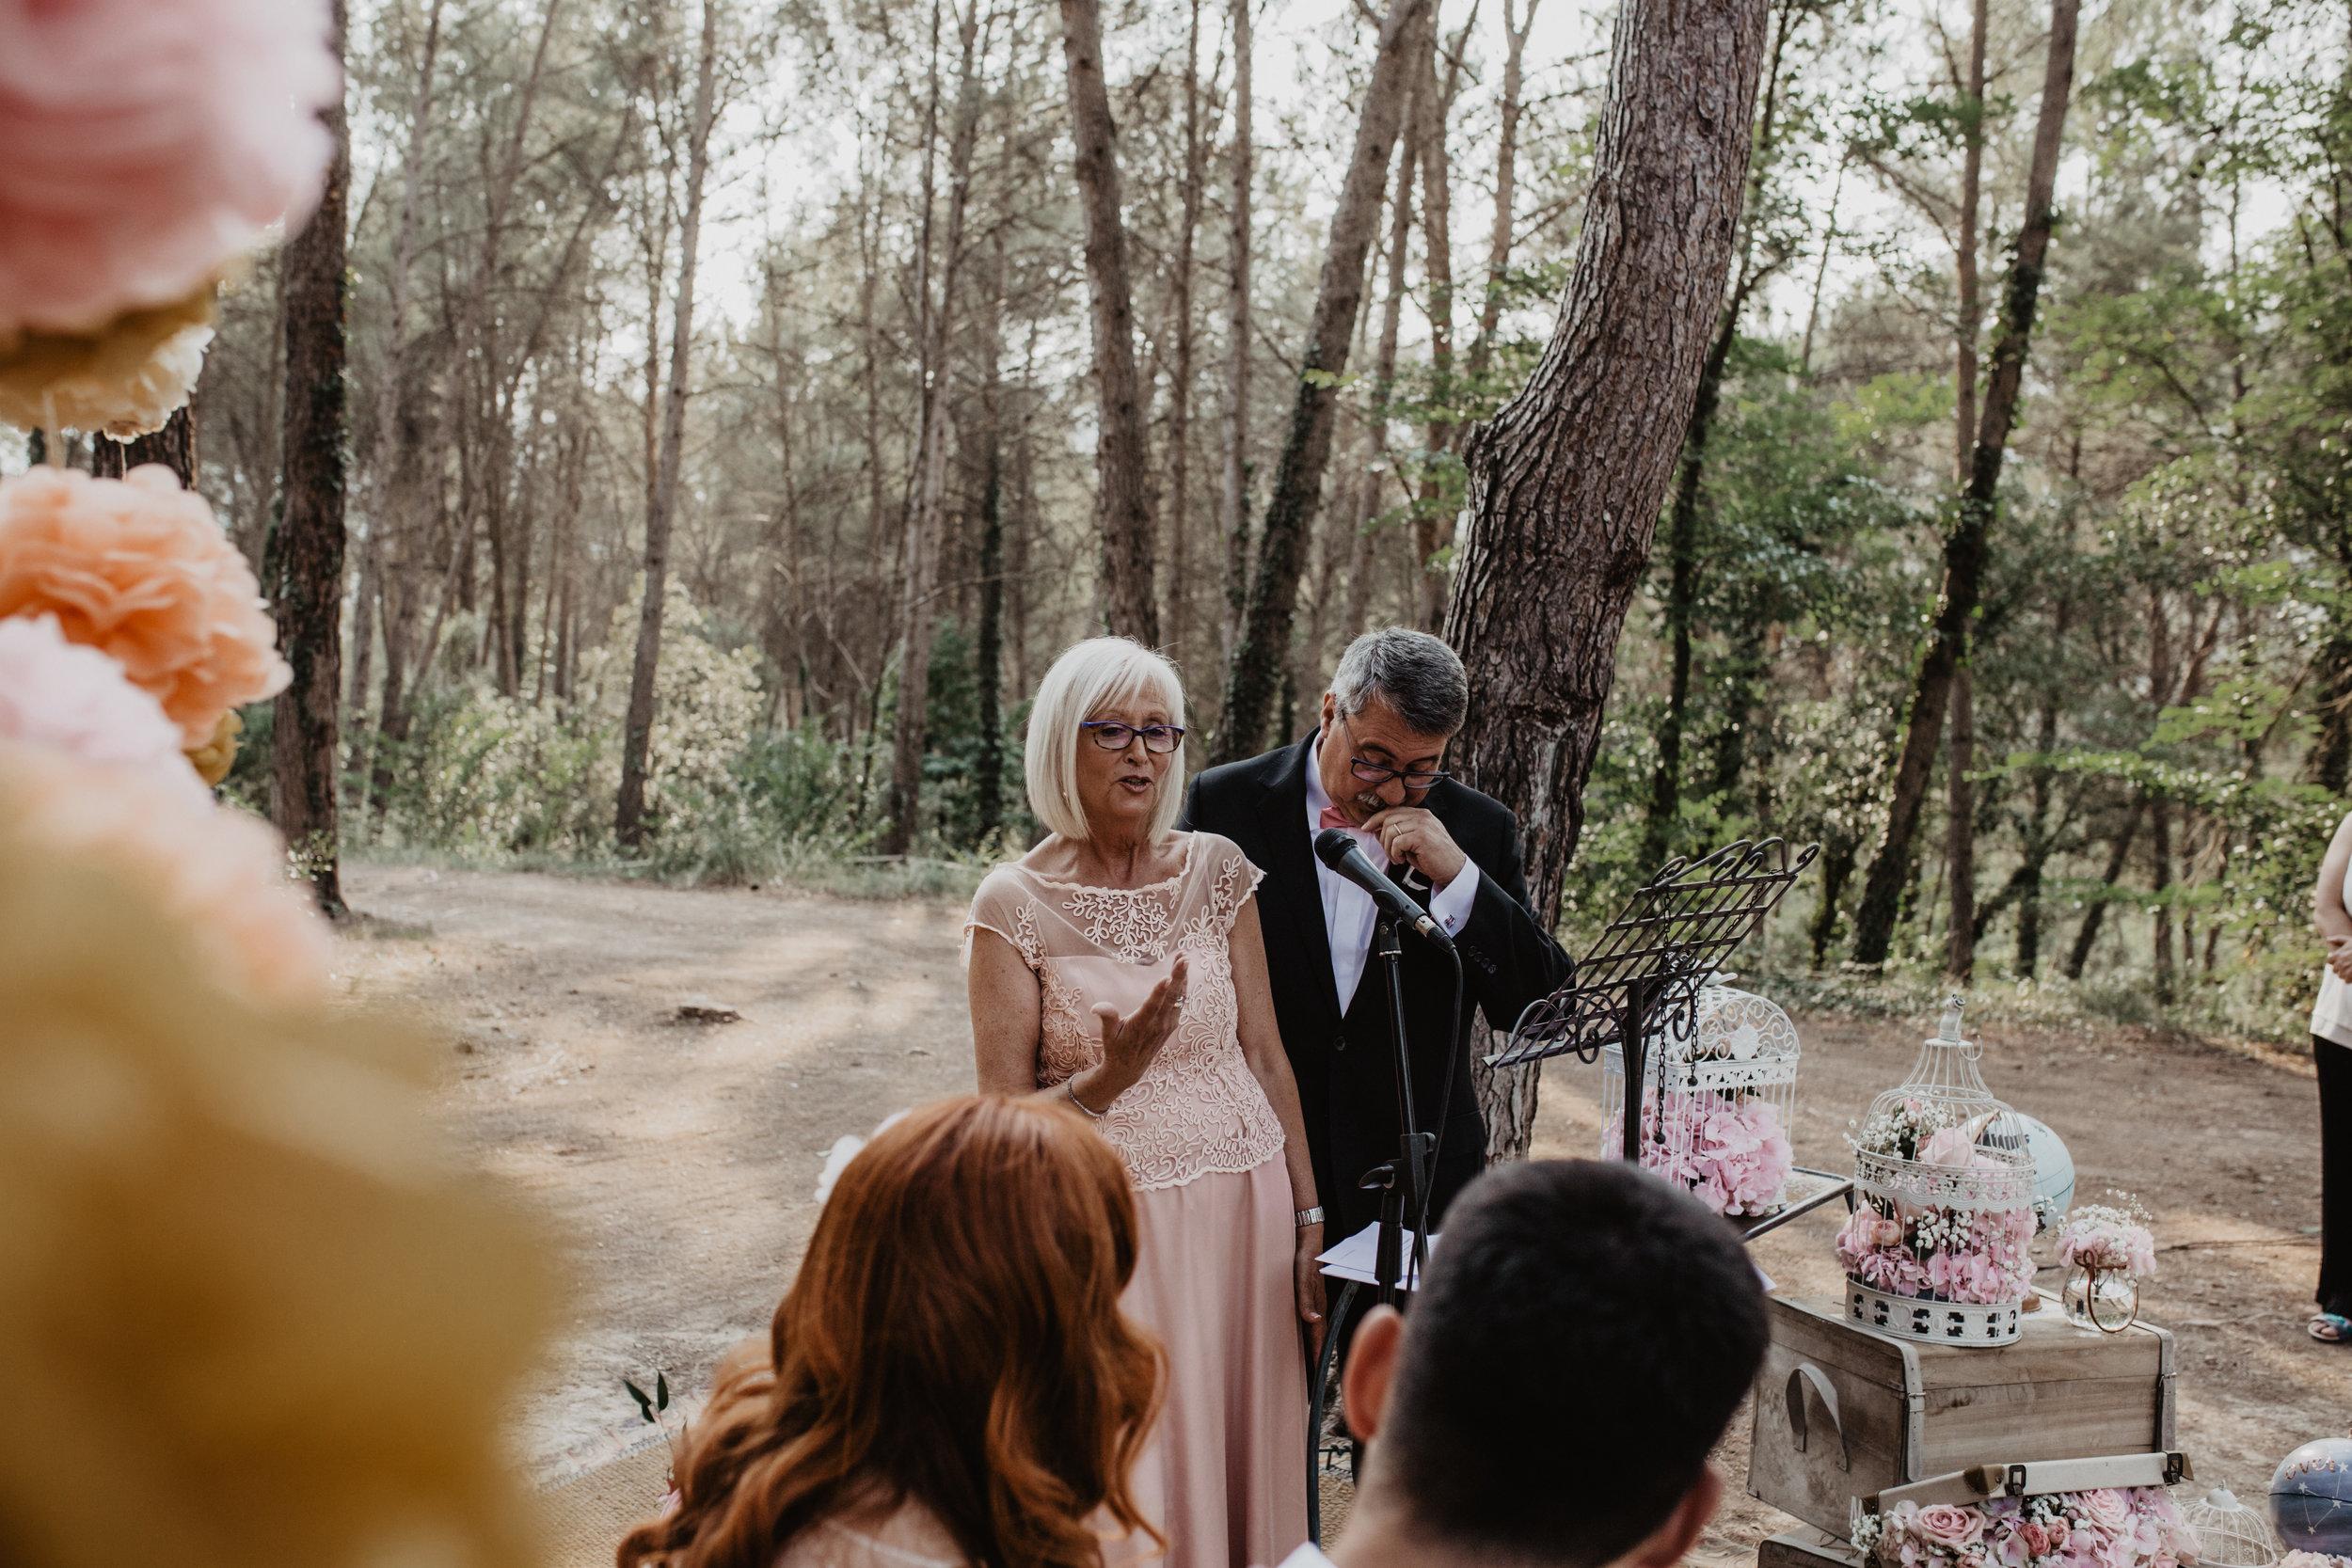 thenortherngirlphotography_photography_thenortherngirl_rebeccascabros_wedding_weddingphotography_masialagarrigadecastelladral_joaniemma_bodaenbarcelona_weddingphotographer_emmaijoan-320.jpg